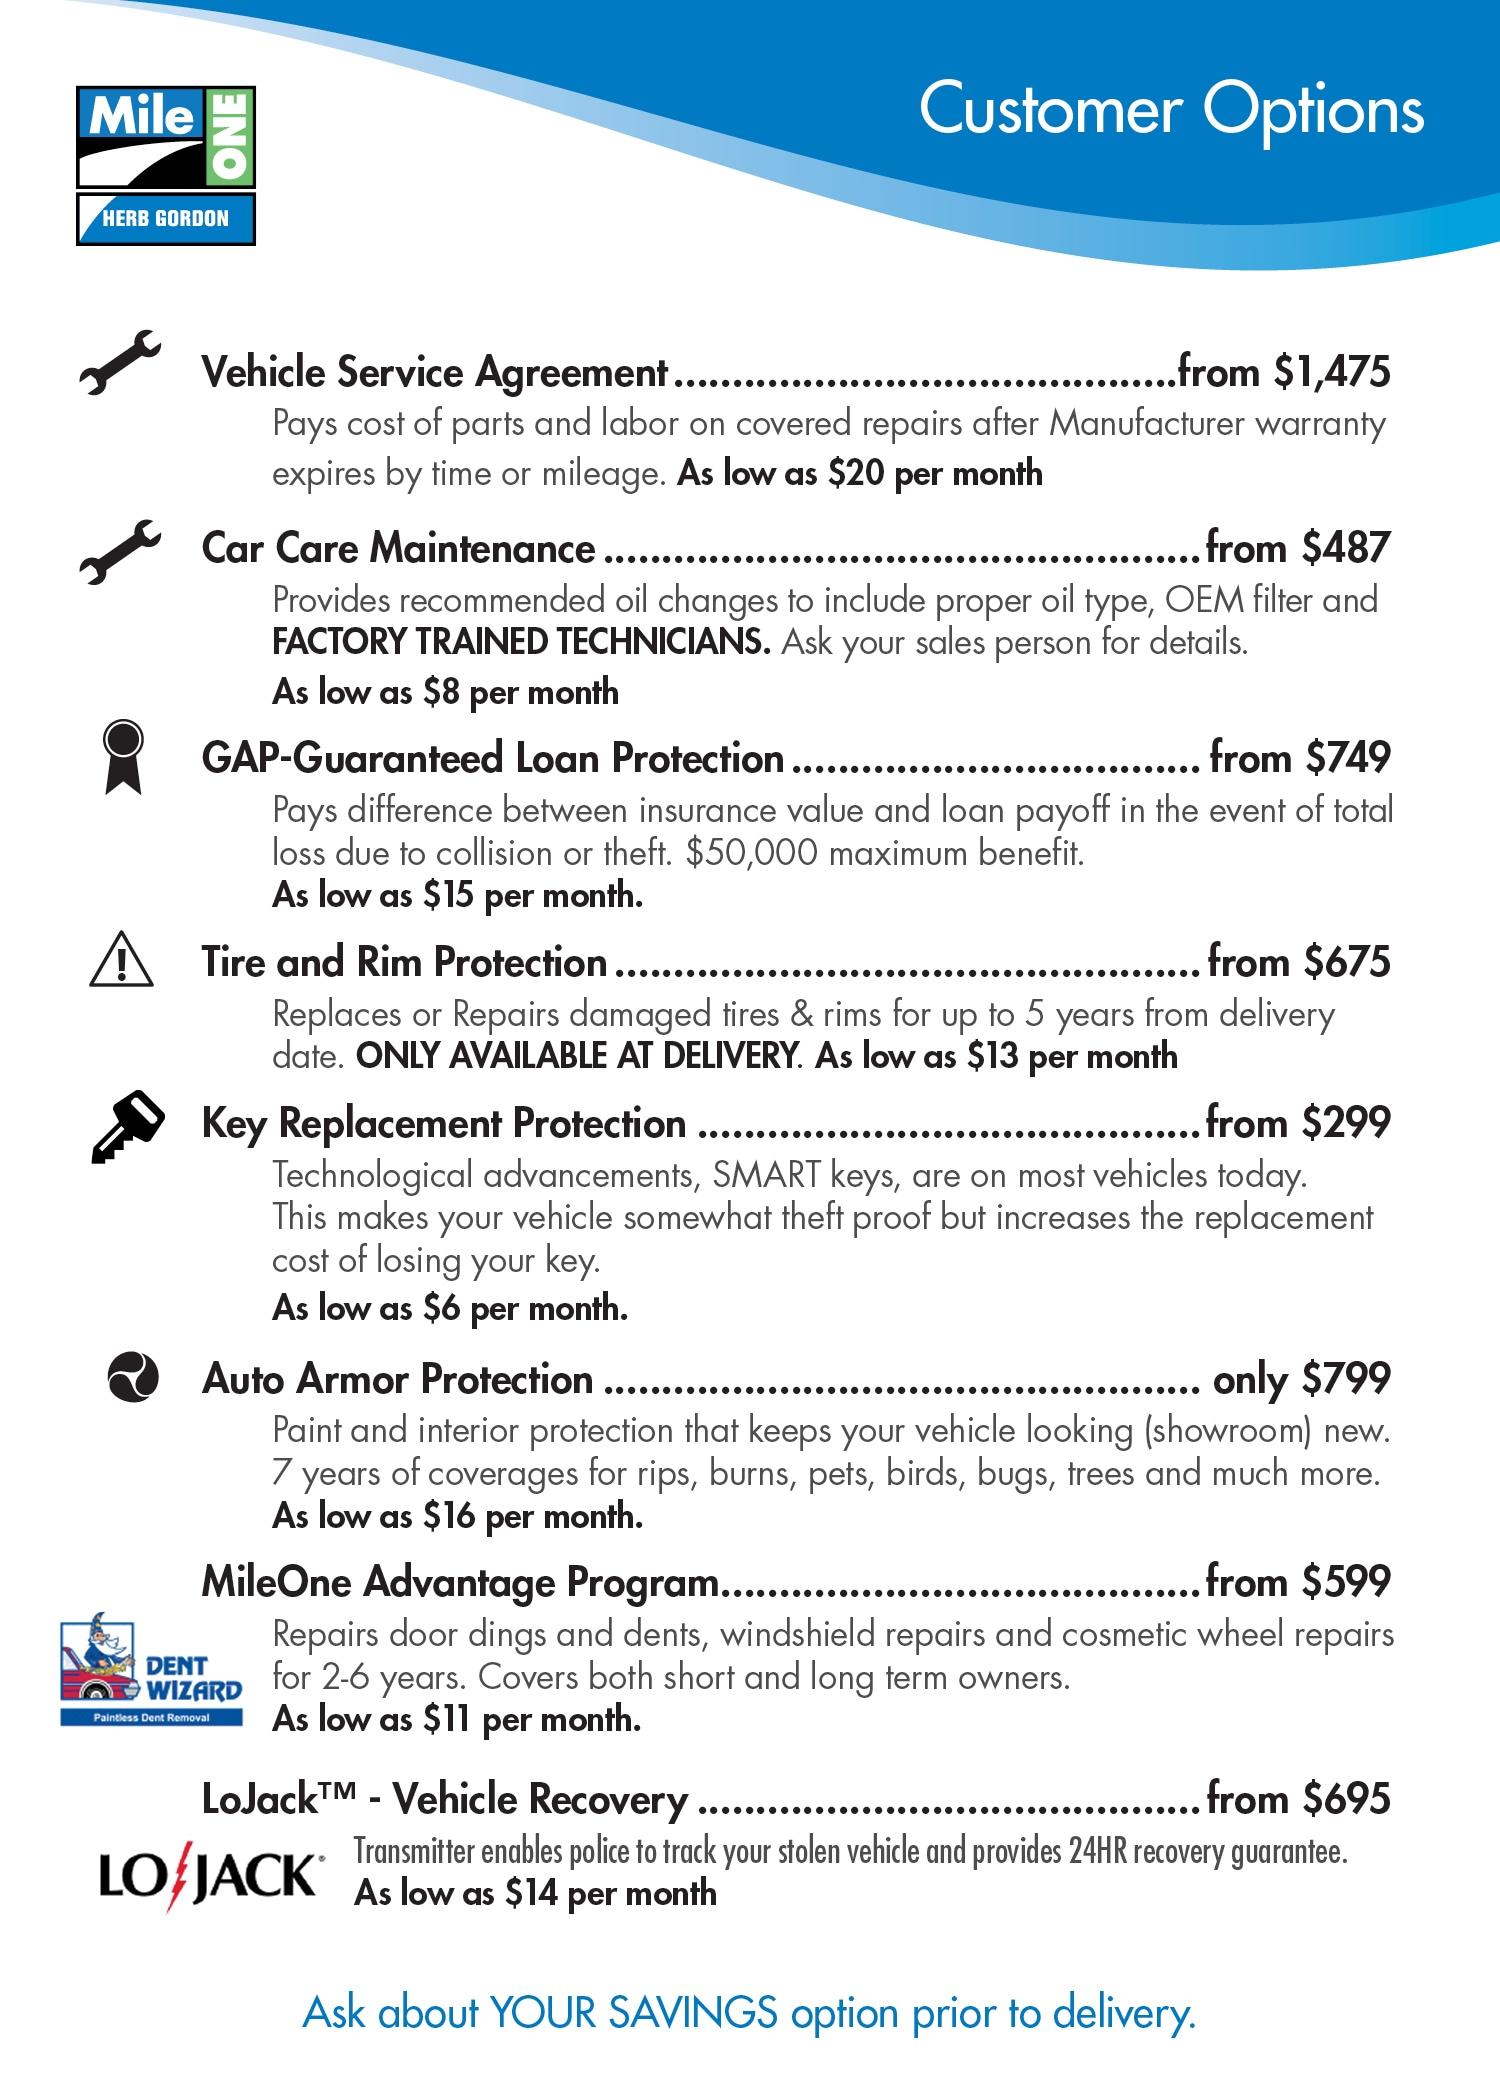 Car Sale Agreement Sample Cost Vip Hostess Cover Letter  853258e33c00a3b3108616b4ac988f6ax Car Sale Agreement Sample Costhtml